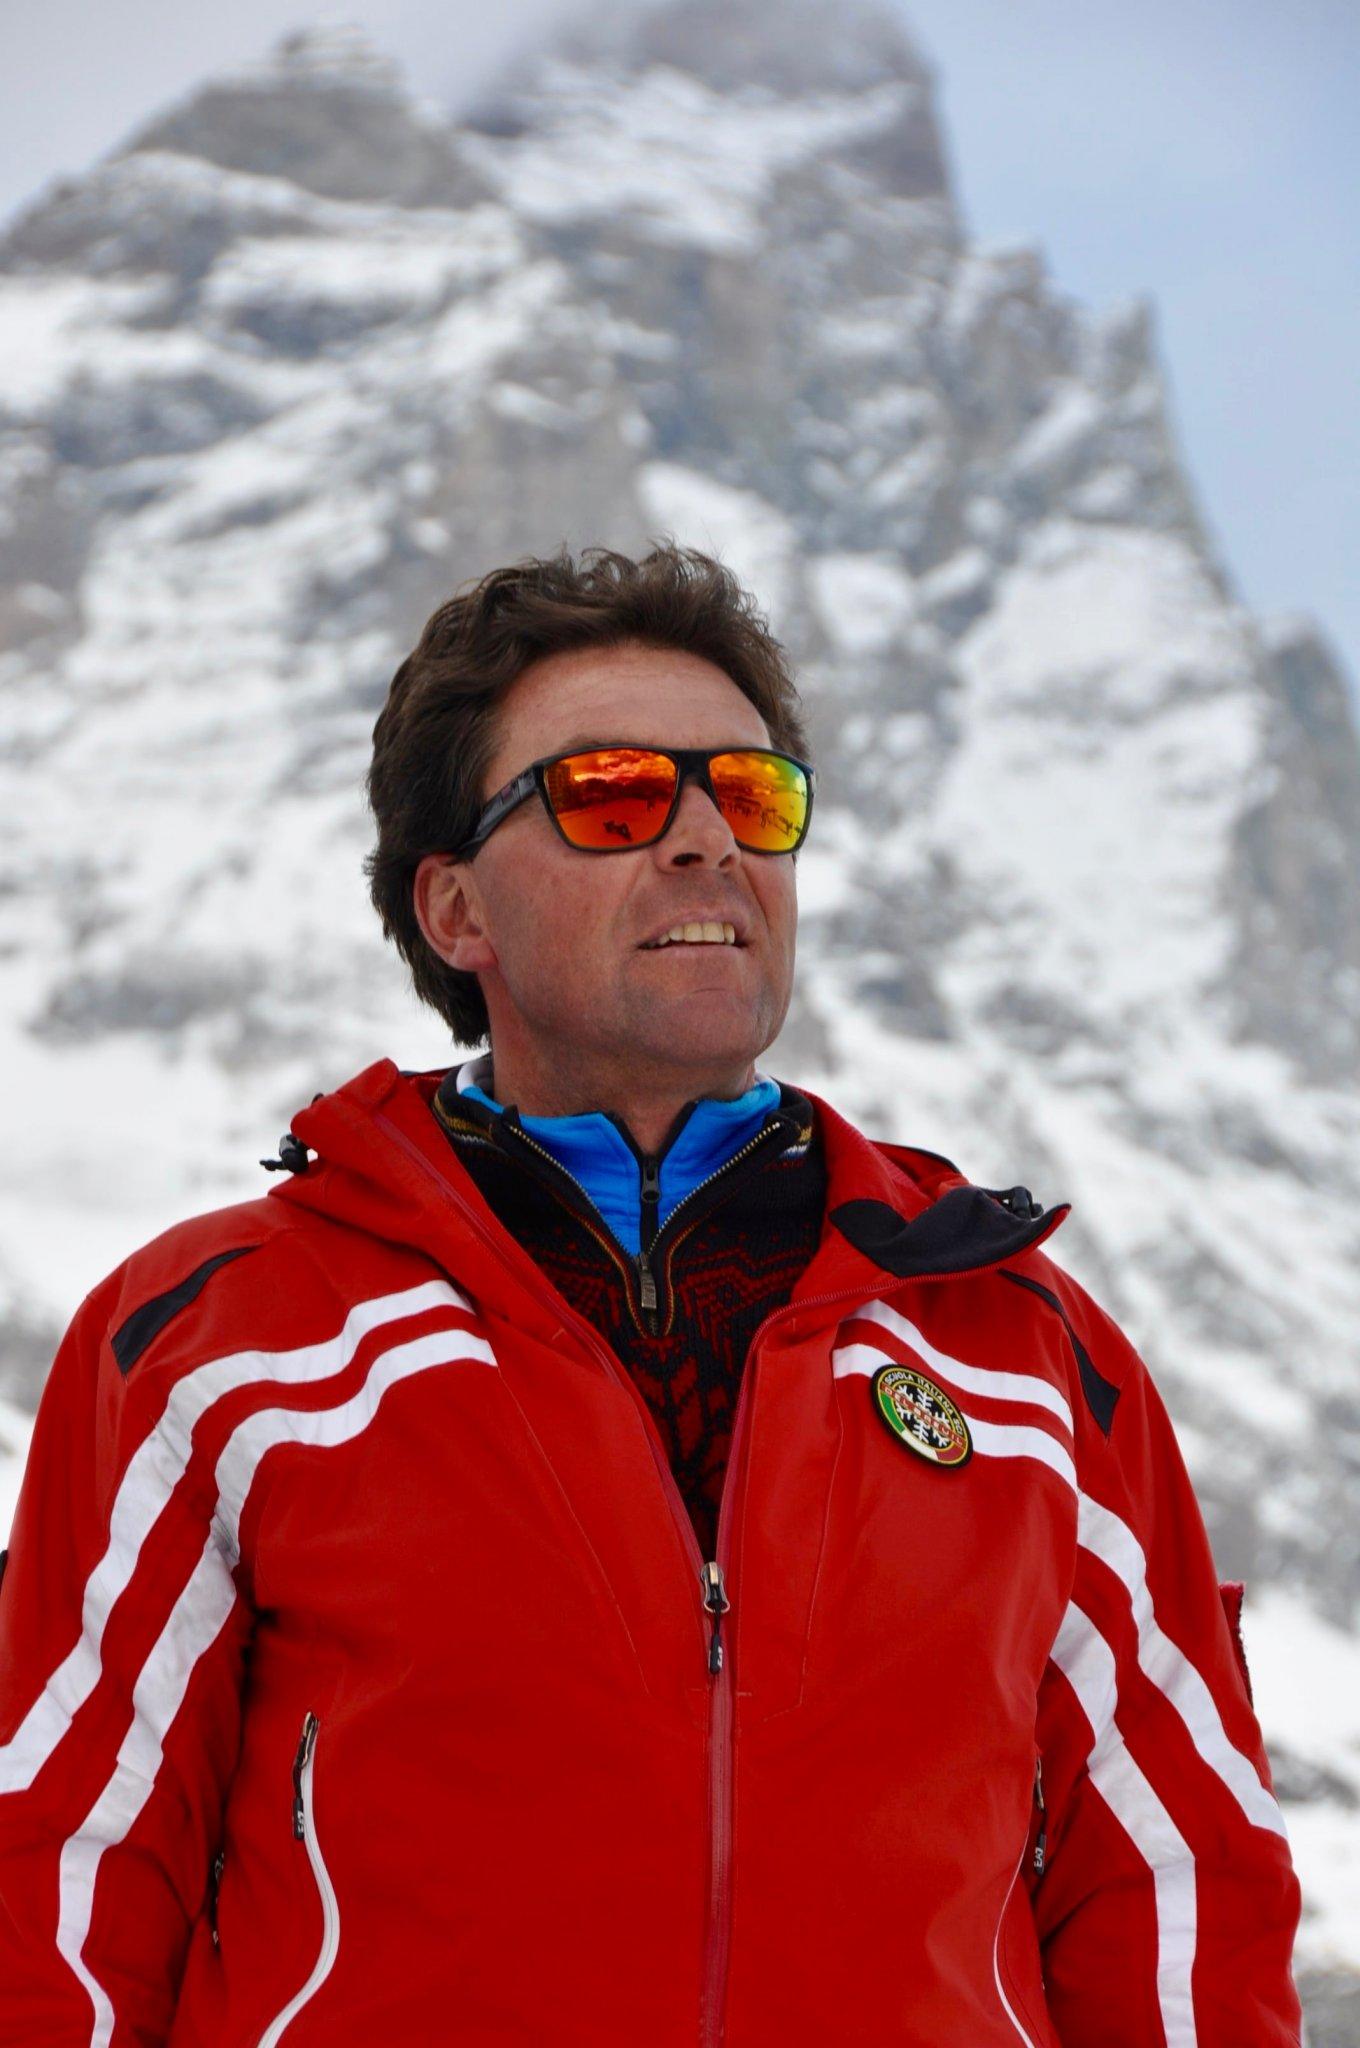 Stefano Pizzini